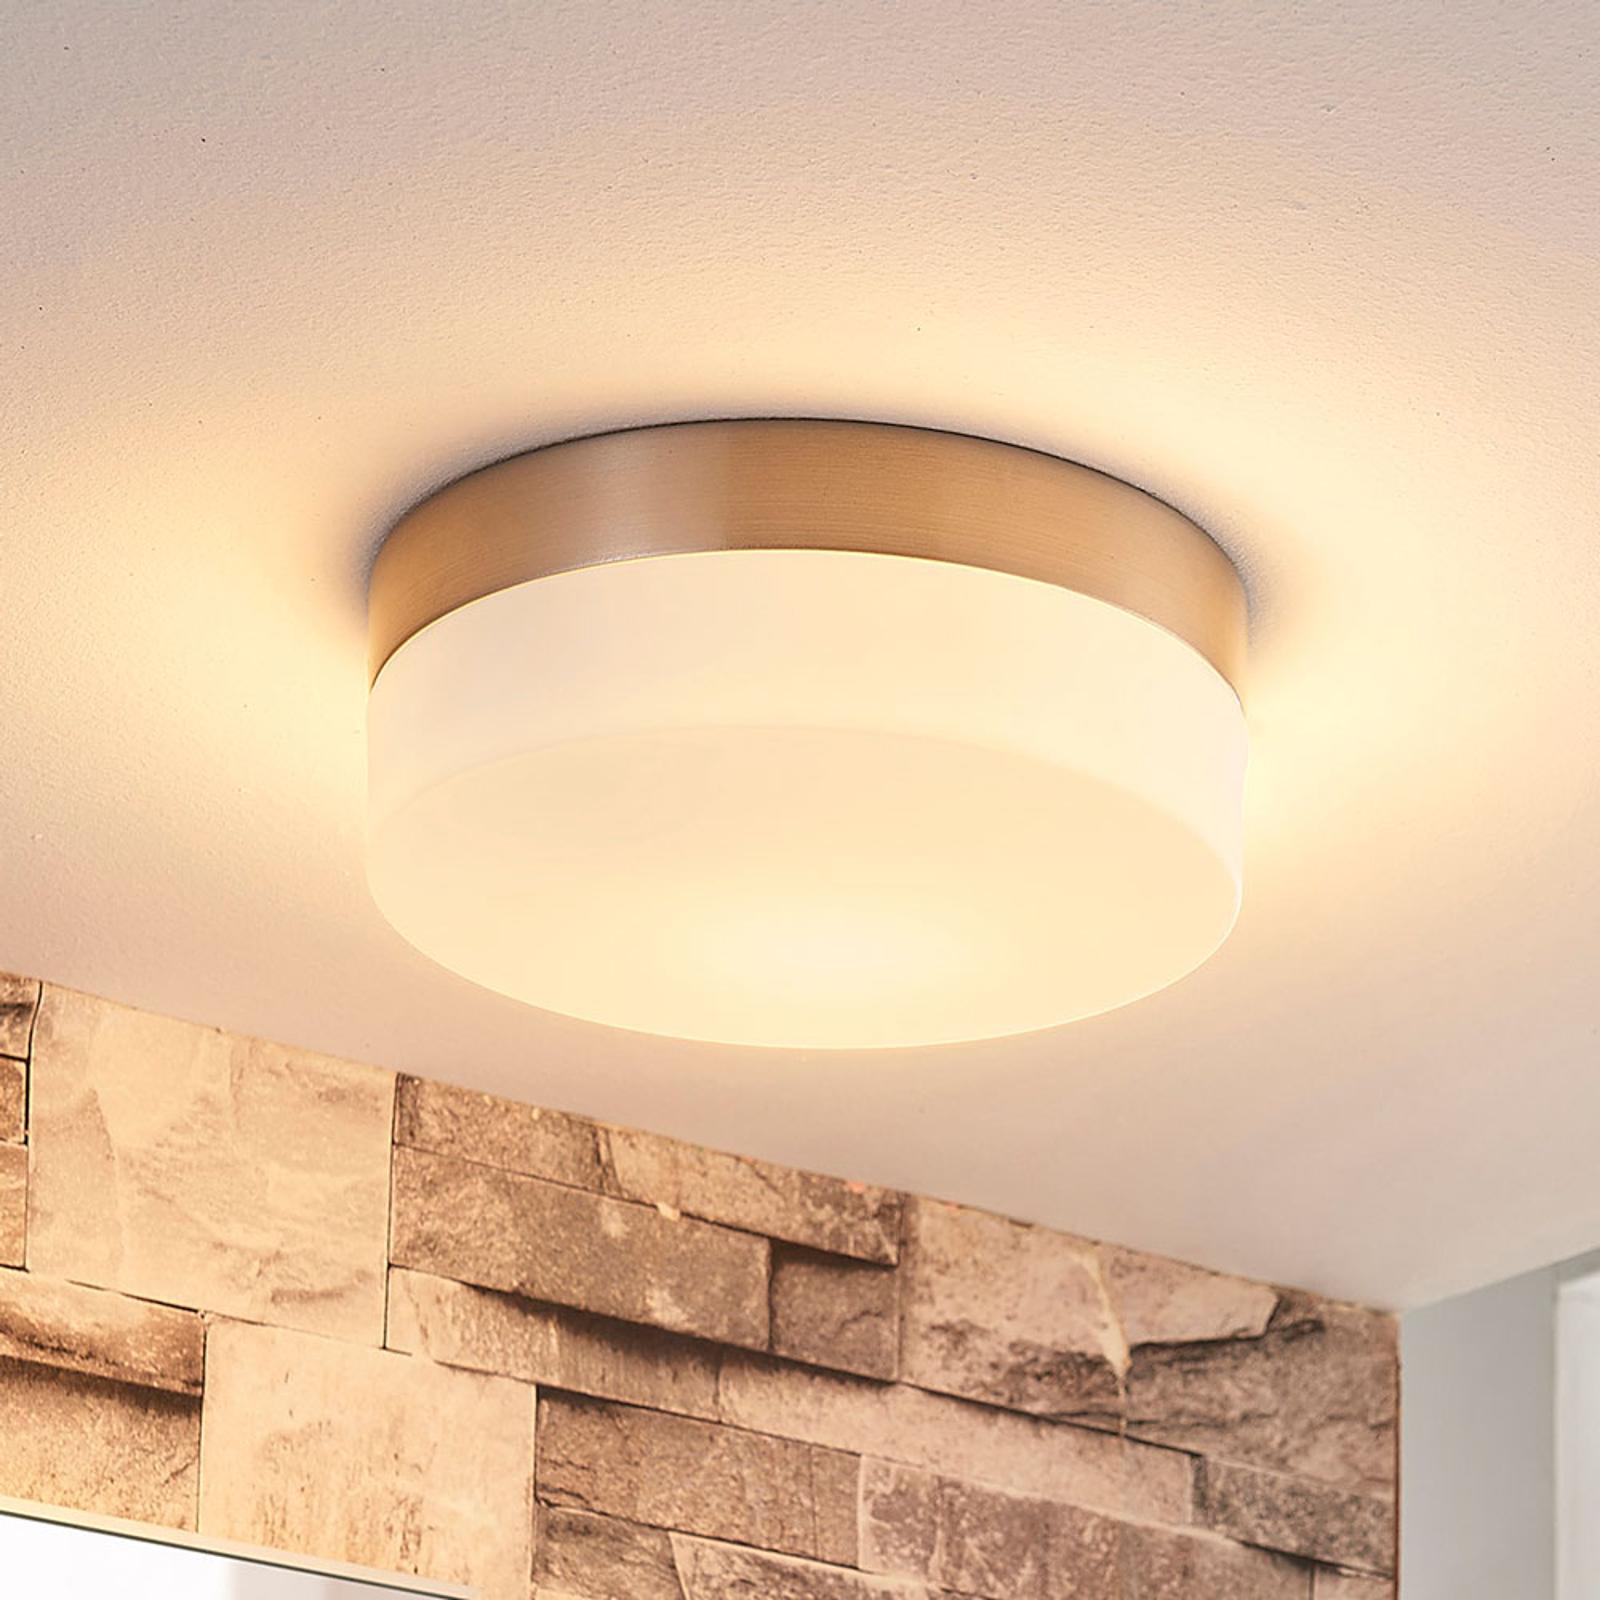 Badkamerplafondlamp Amilia met glazen kap